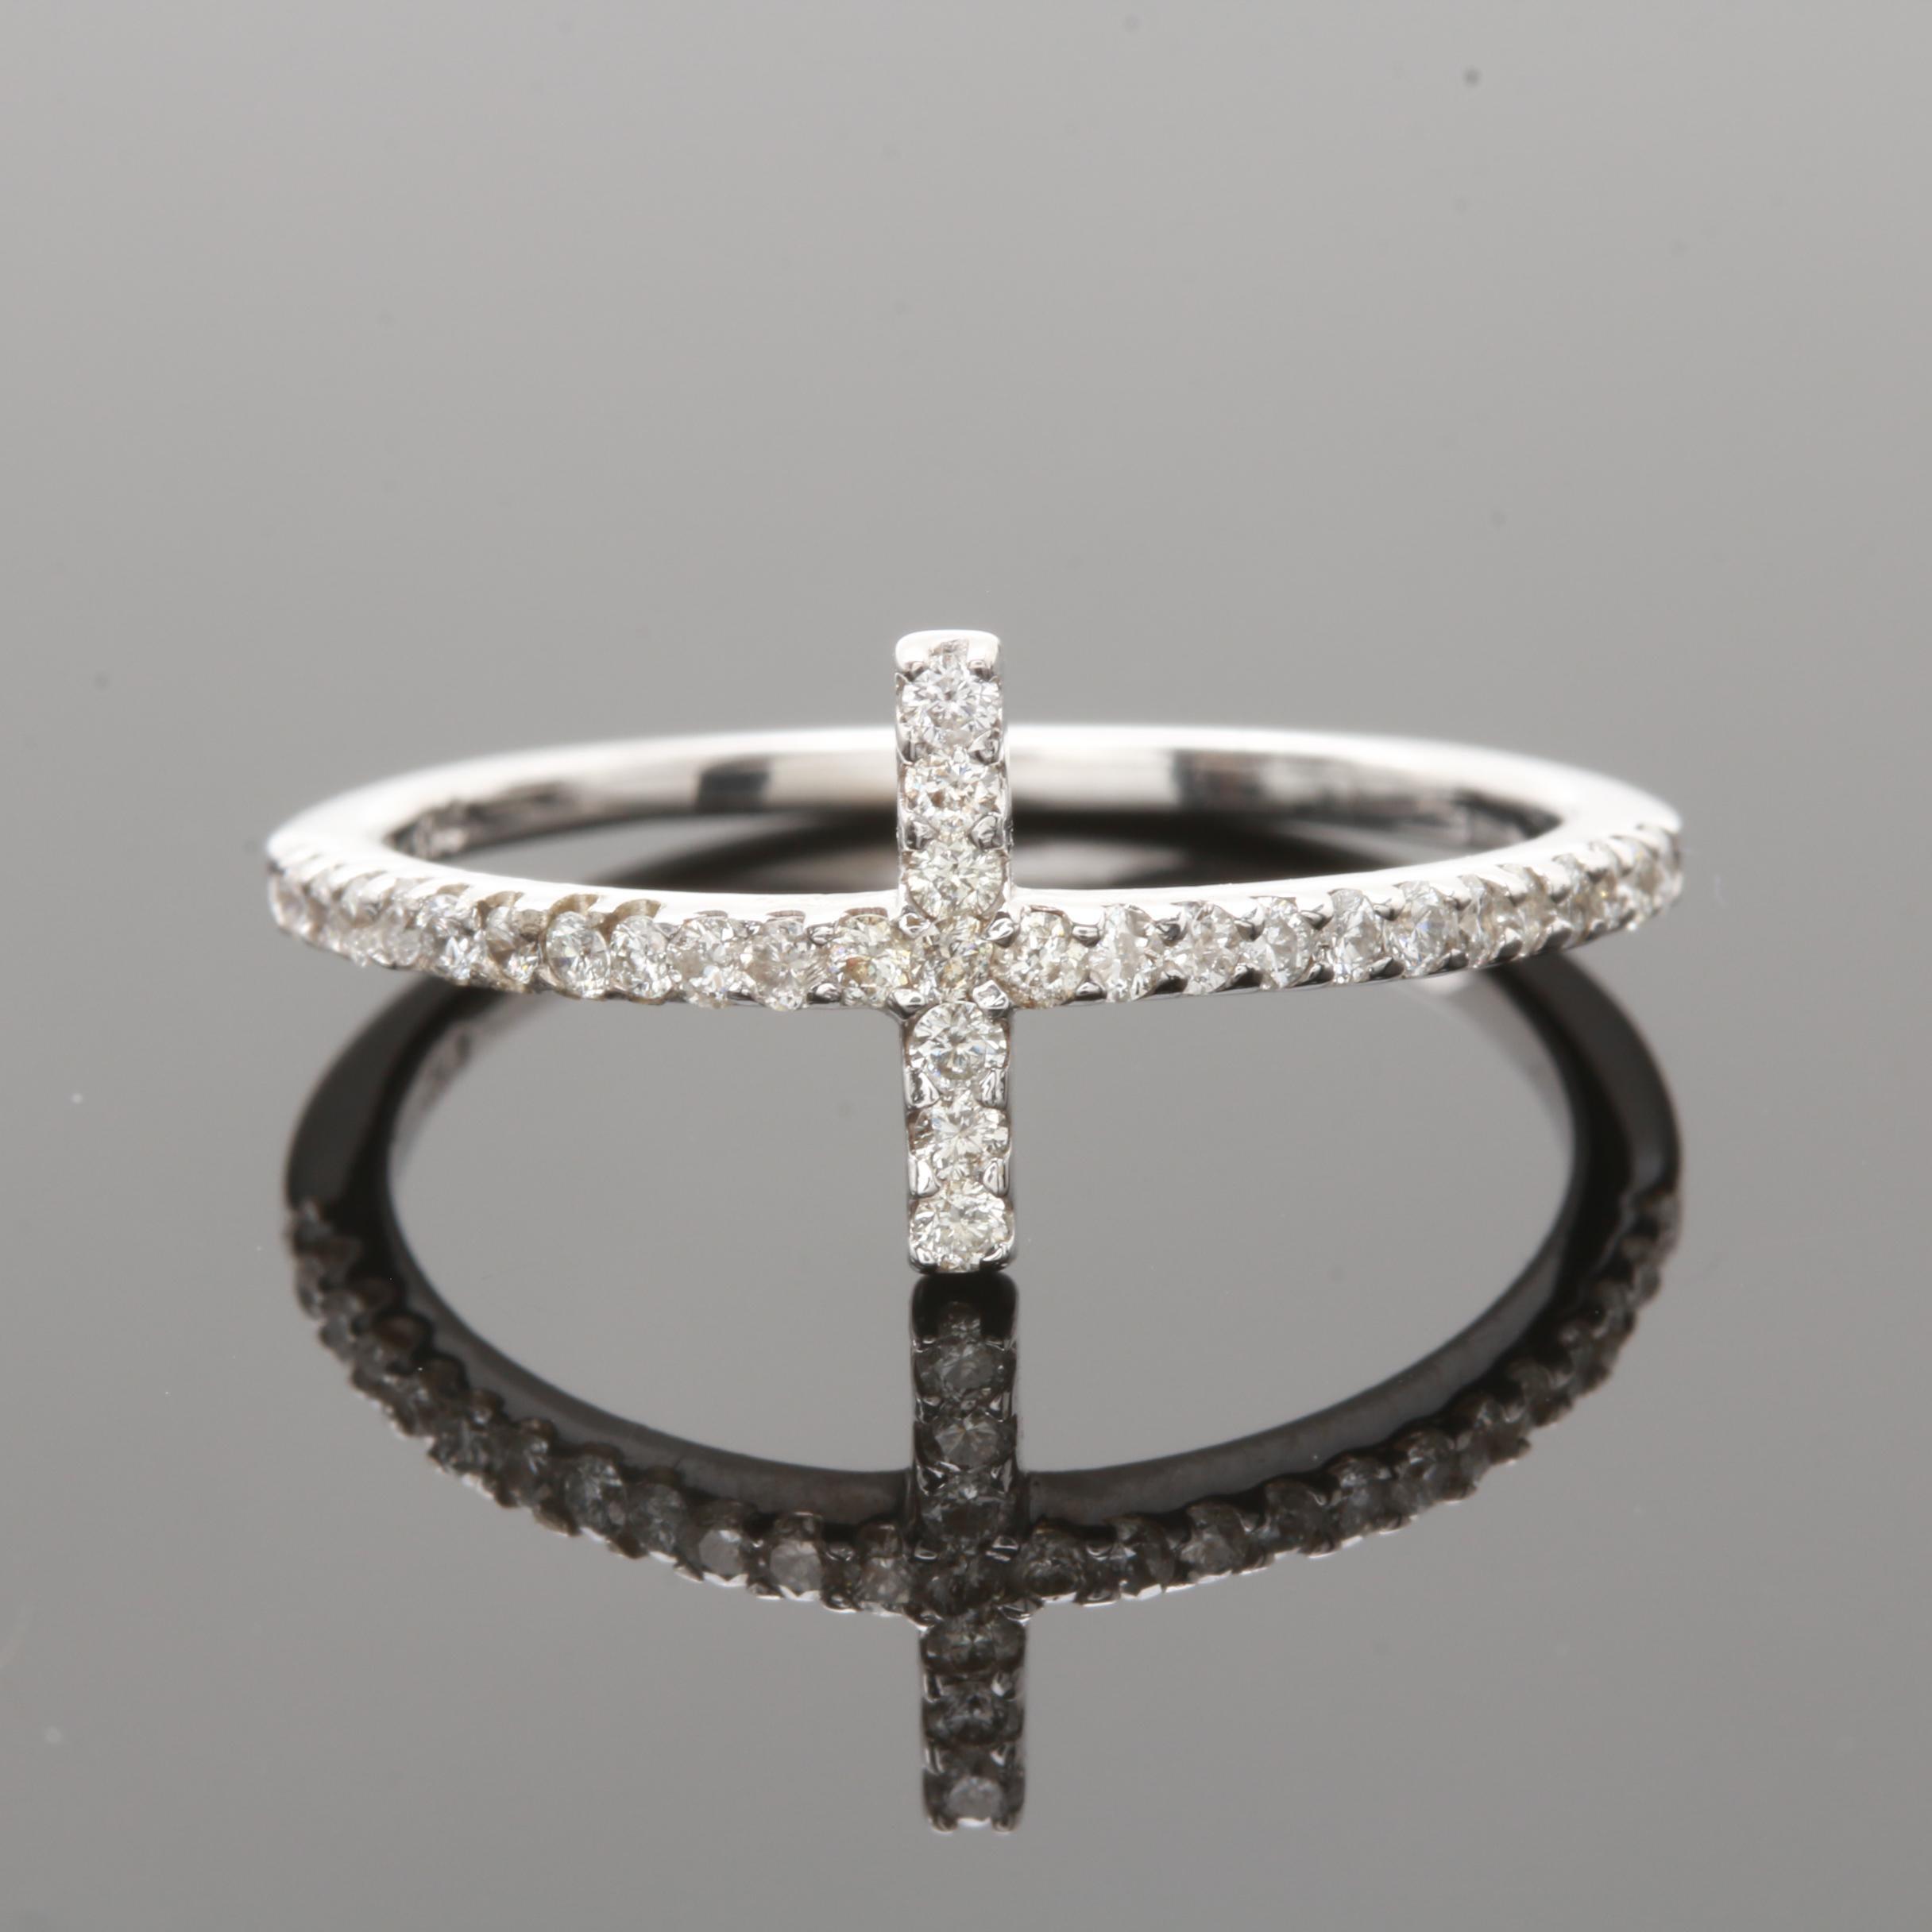 14K White Gold Diamond Geometric Ring